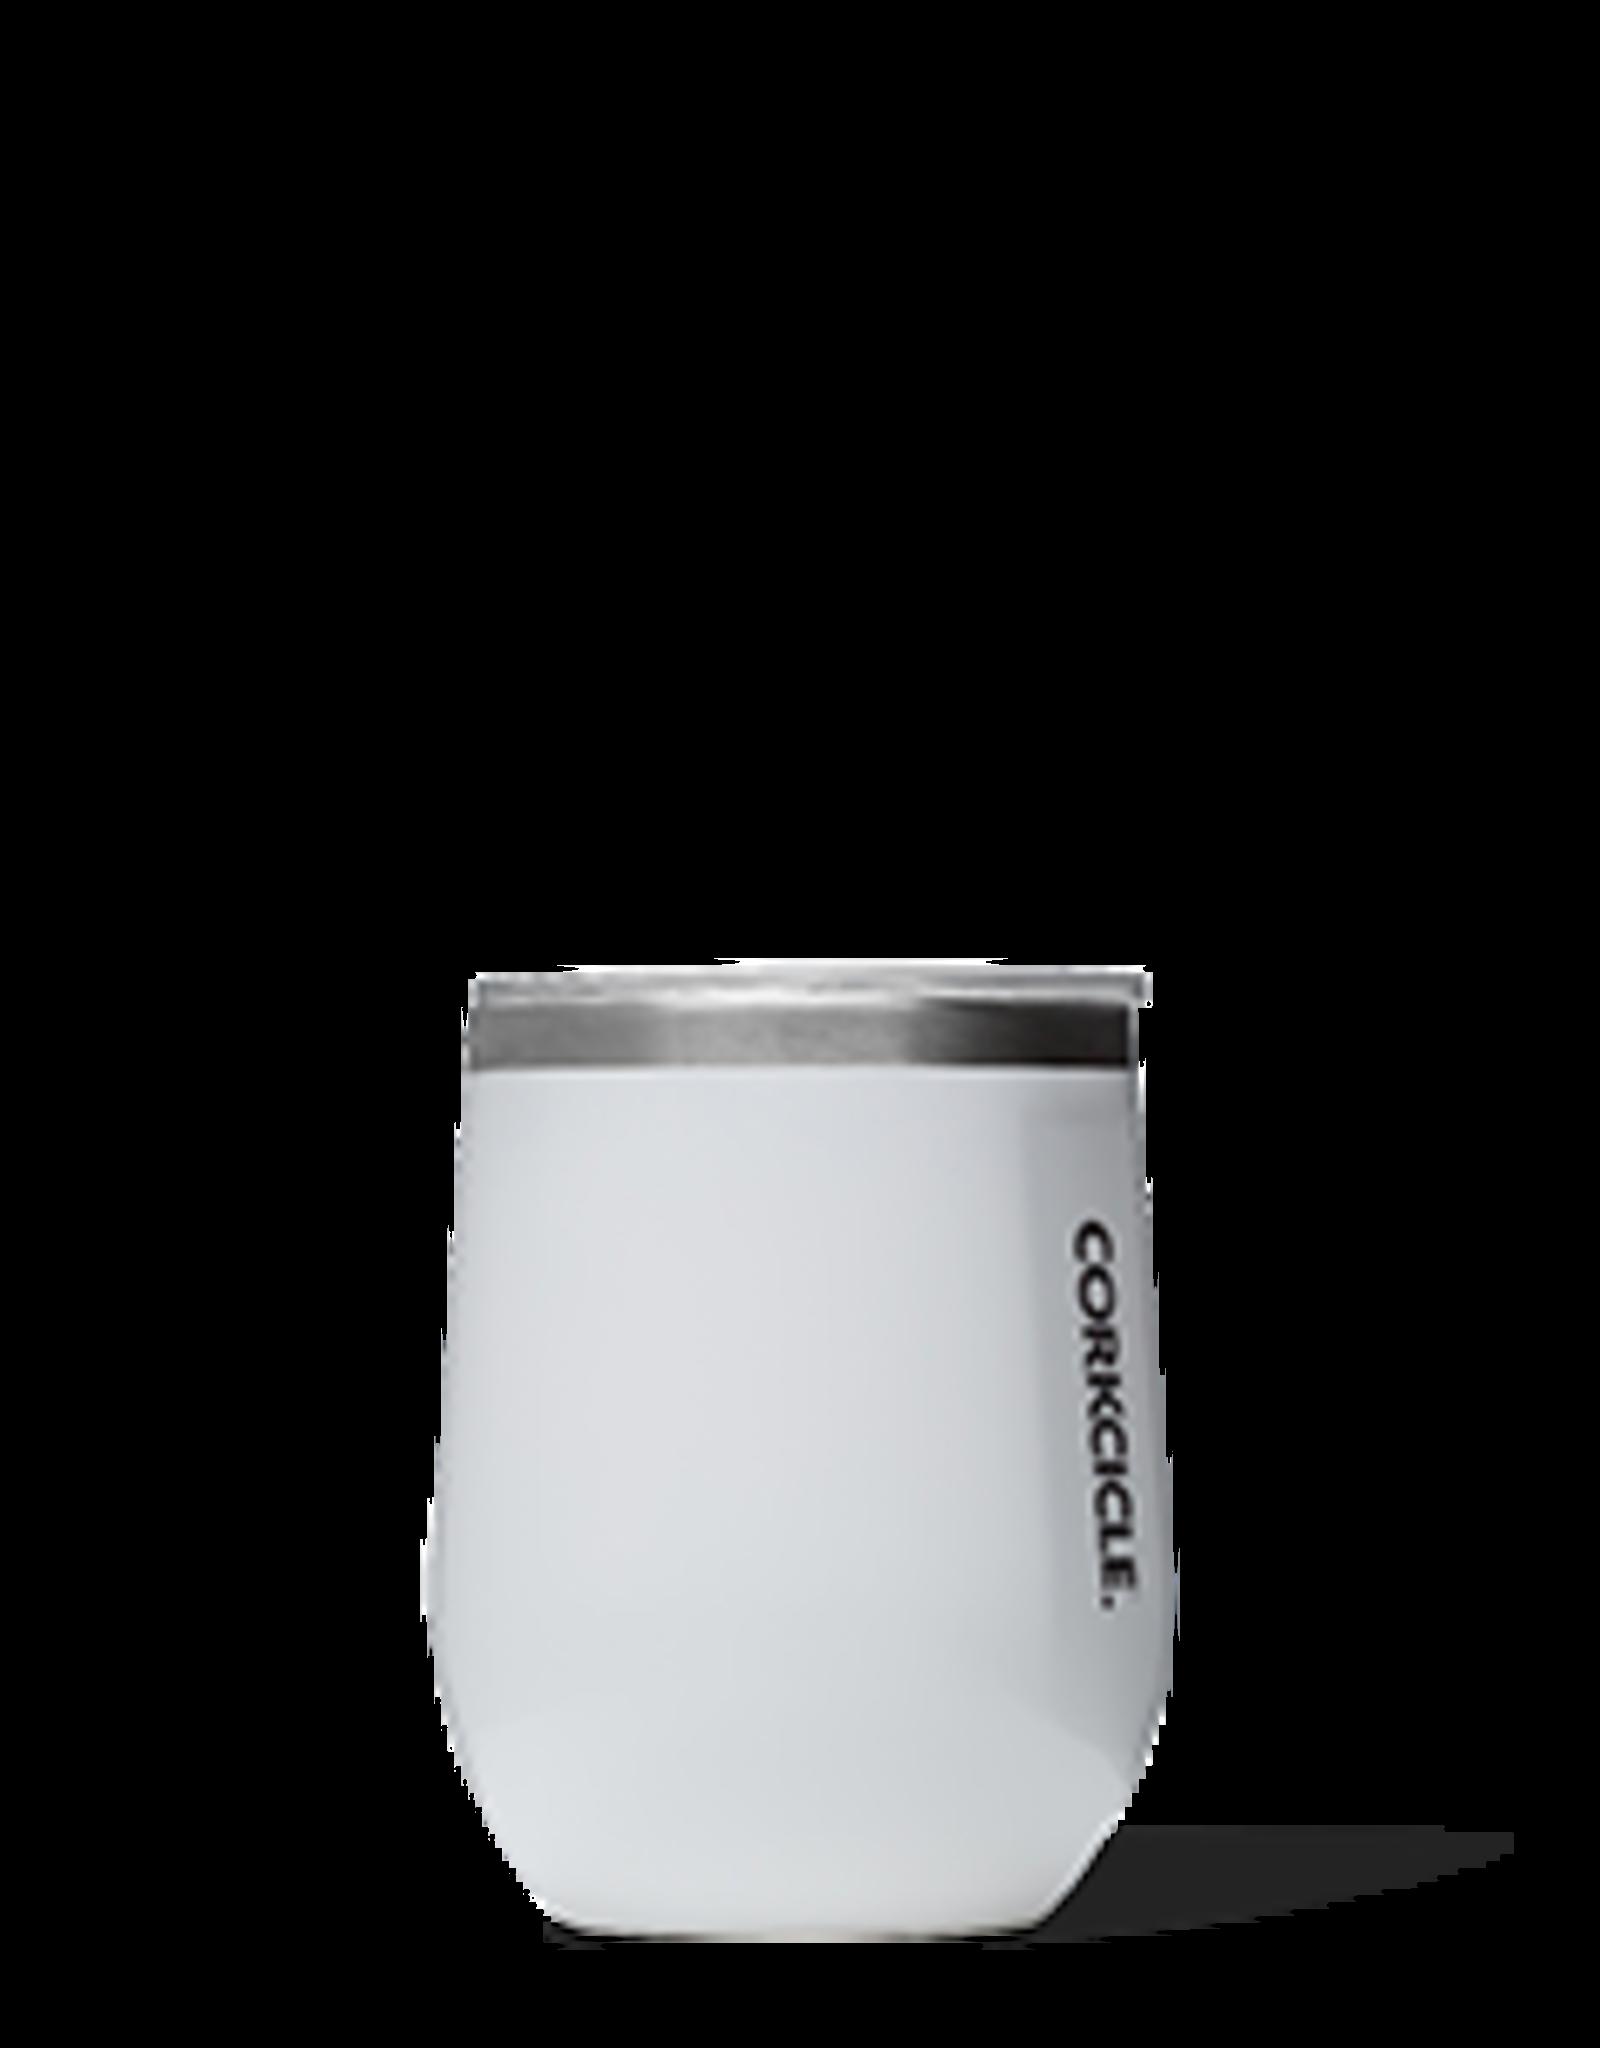 Corkcicle Stemless Wine Glass- 12oz White